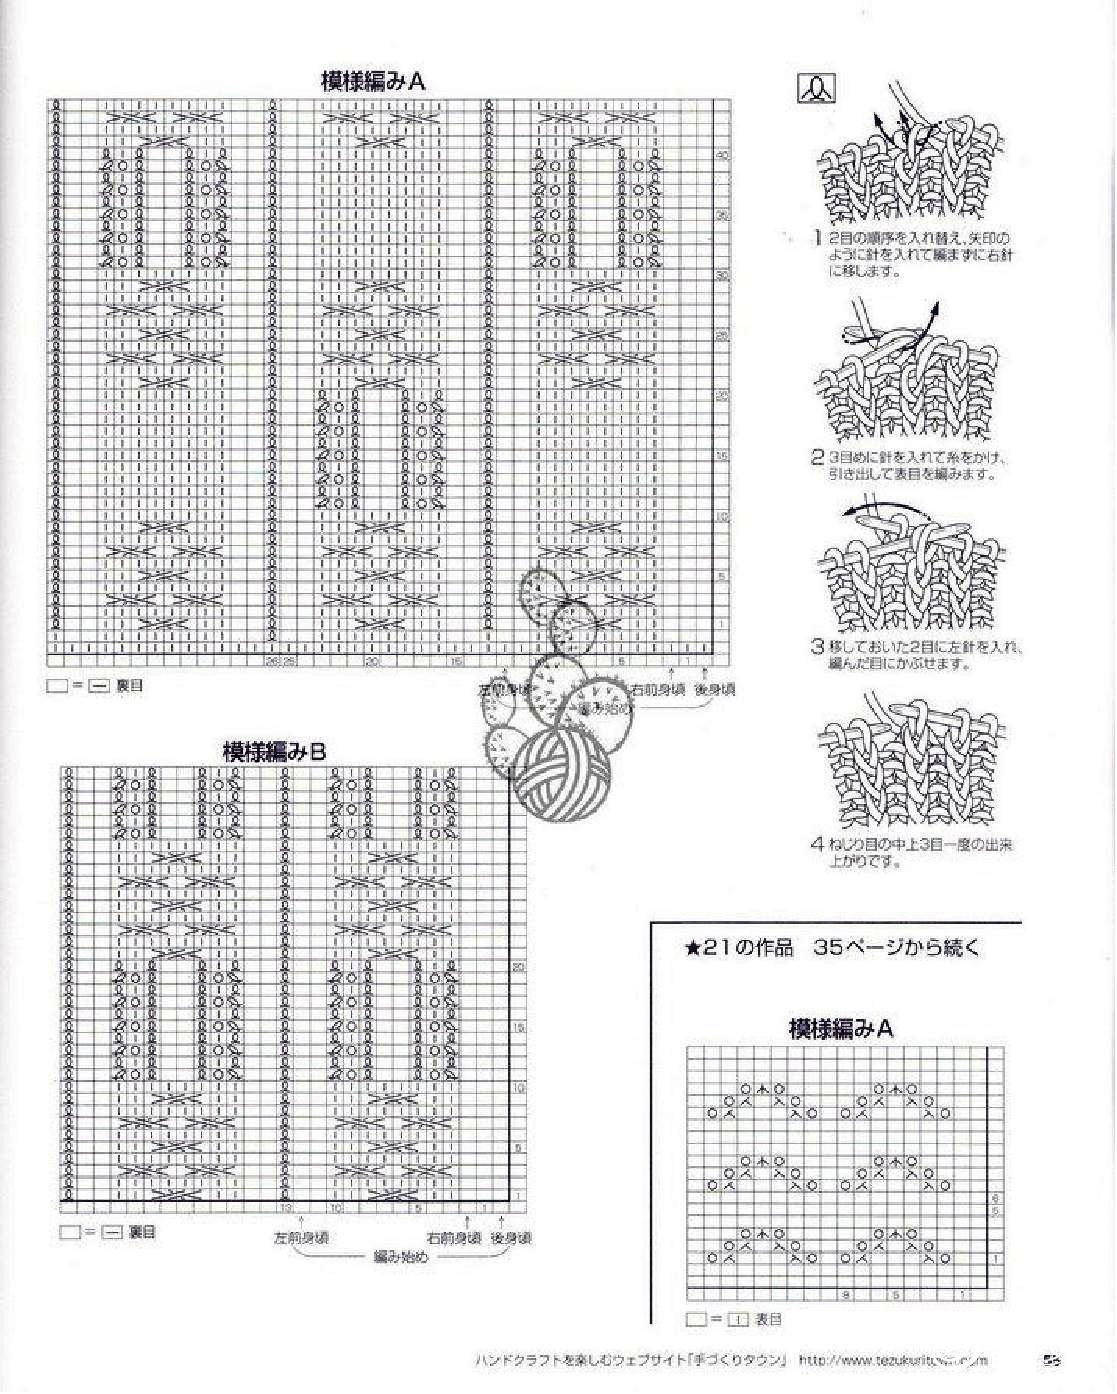 NV80258_page55_image1.jpg